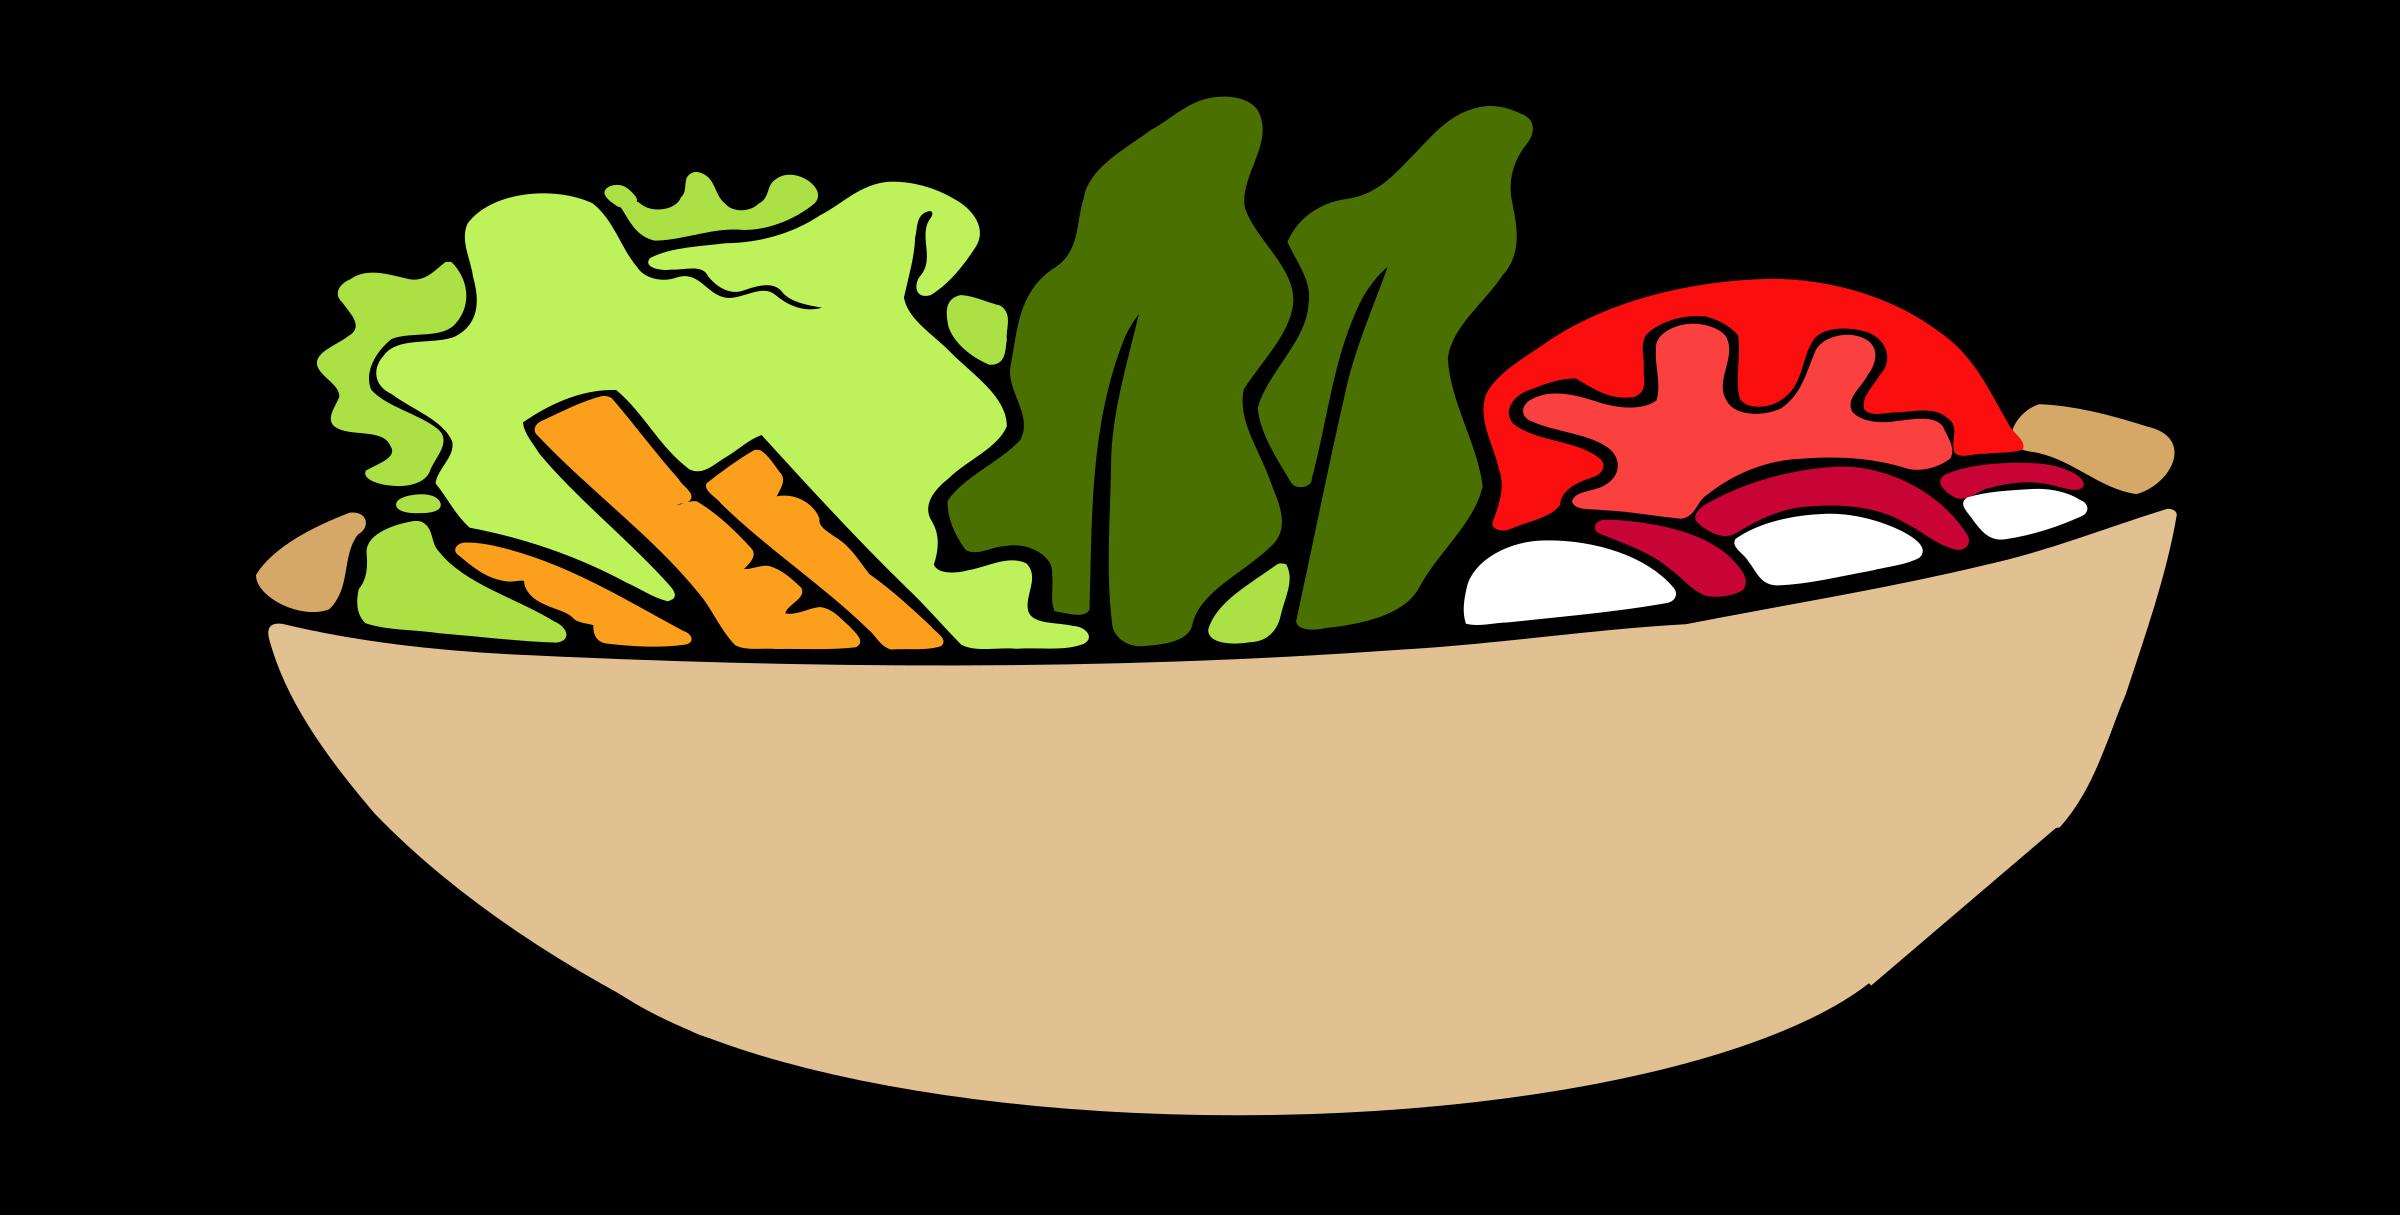 Bowl clipart salad bowl, Bowl salad bowl Transparent FREE.